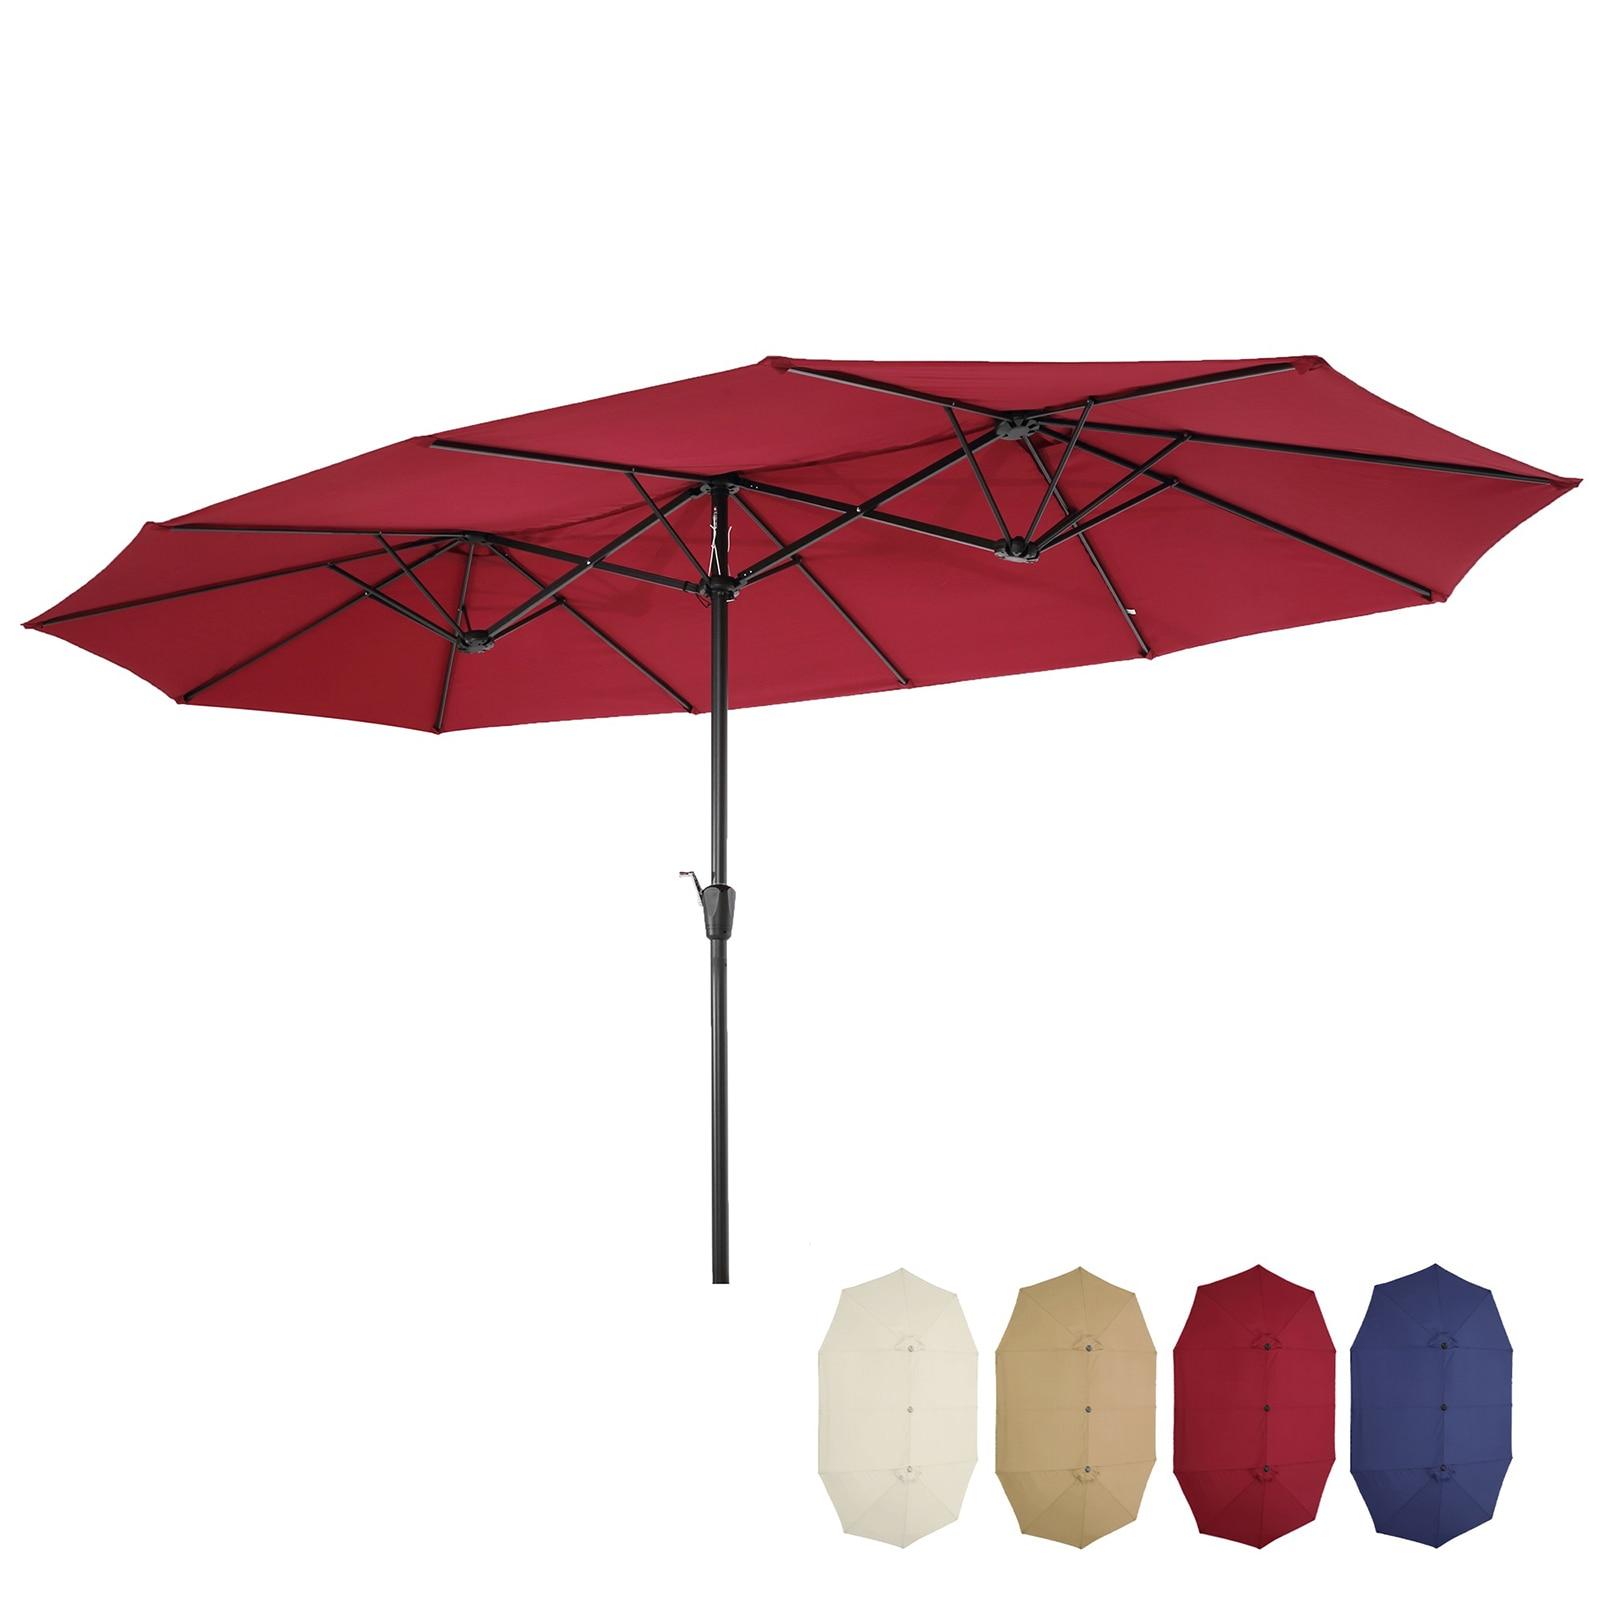 4 Colors 15x9ft Sunshade Large Double-Sided Rectangular Outdoor Aluminum Twin Patio Market Umbrella[US-Depot]